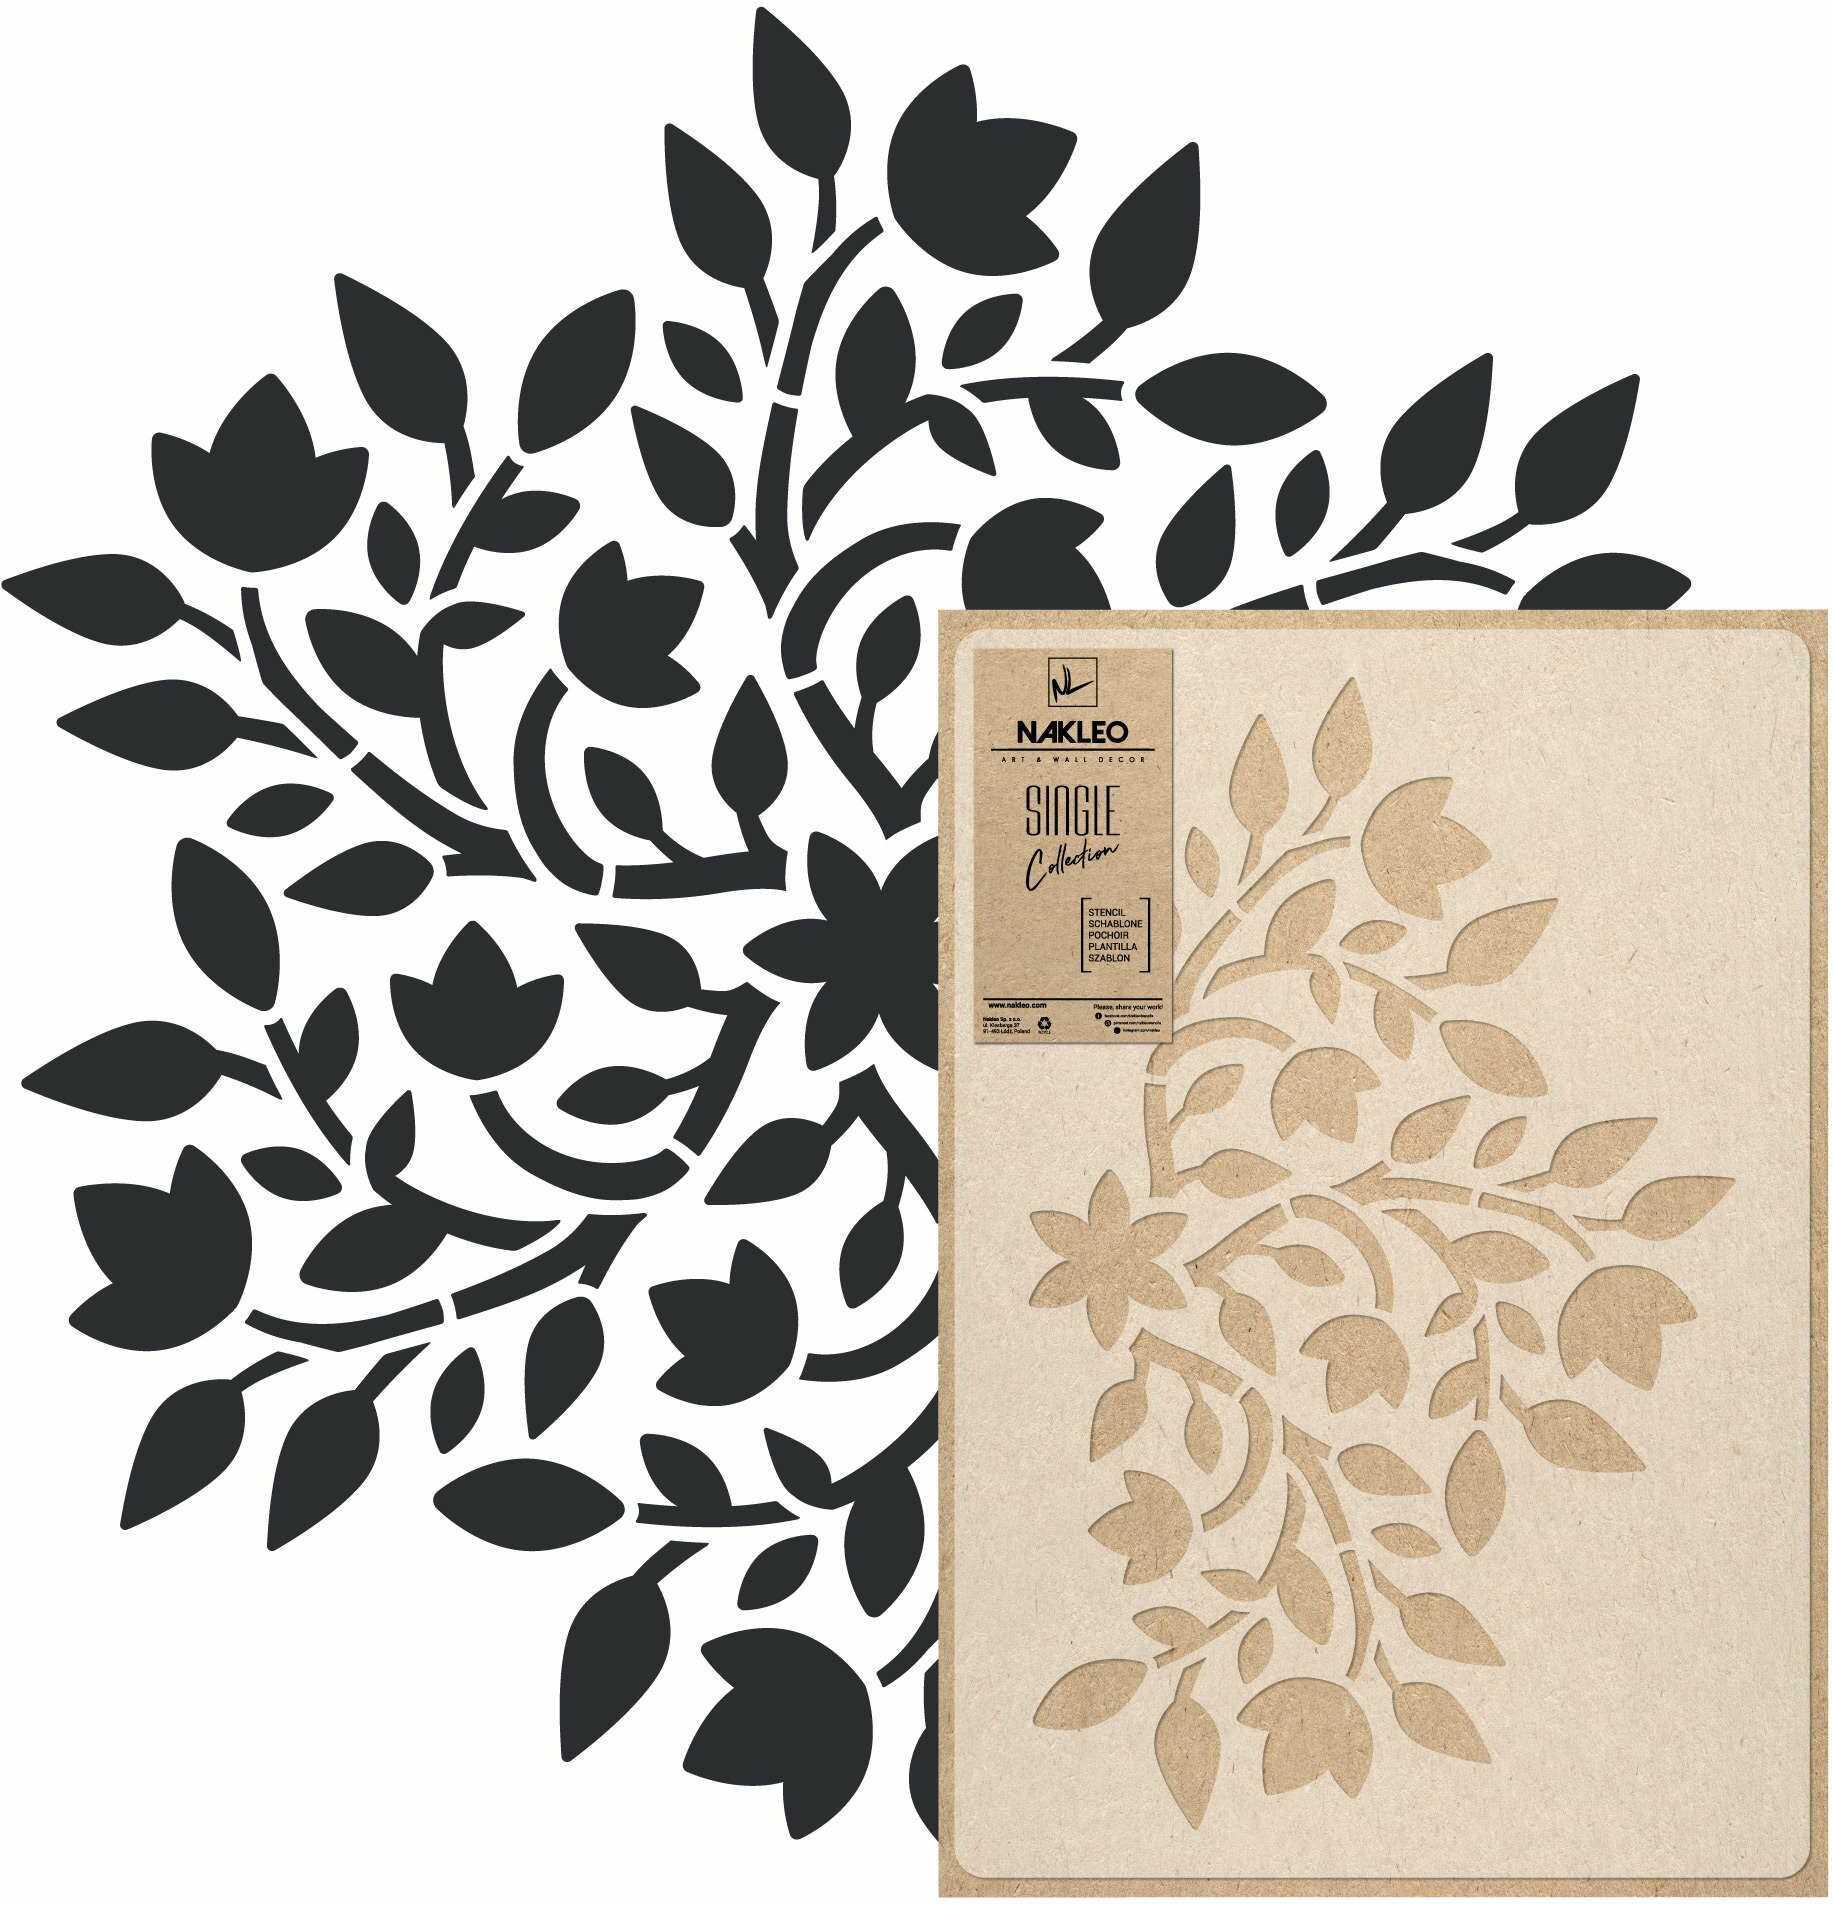 szablon malarski wielokrotny // MANDALA #02 - MEDIUM (45x65cm)